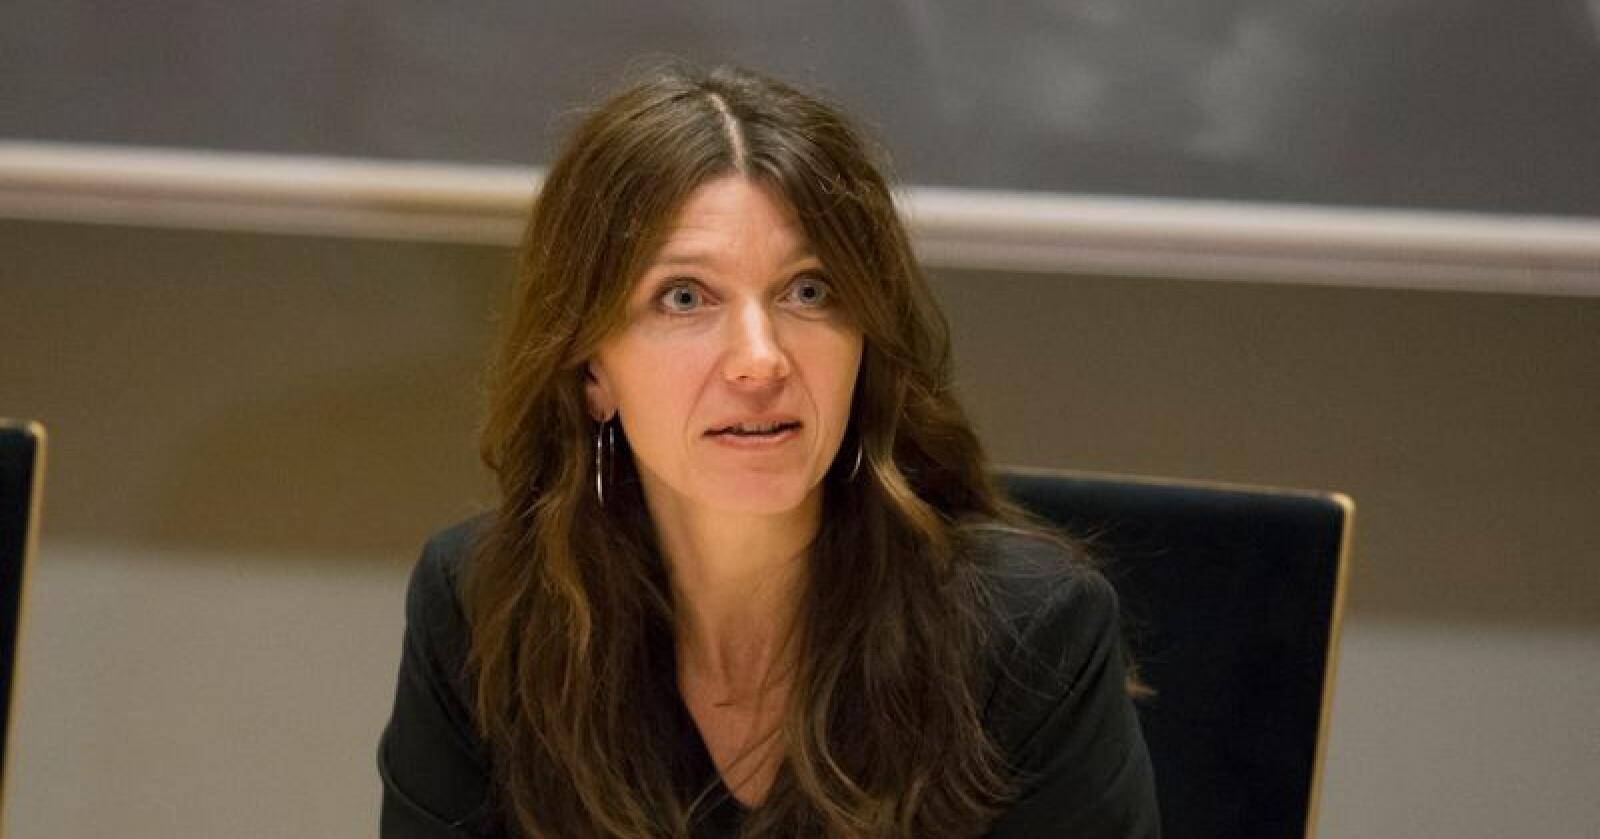 – Det vi ber om er ganske enkelt konkurranse på like vilkår, sier Administrerende direktør Anne-Cecilie Kaltenborn i NHO Service og Handel. Foto: Torstein Bøe / NTB SCANPIX–